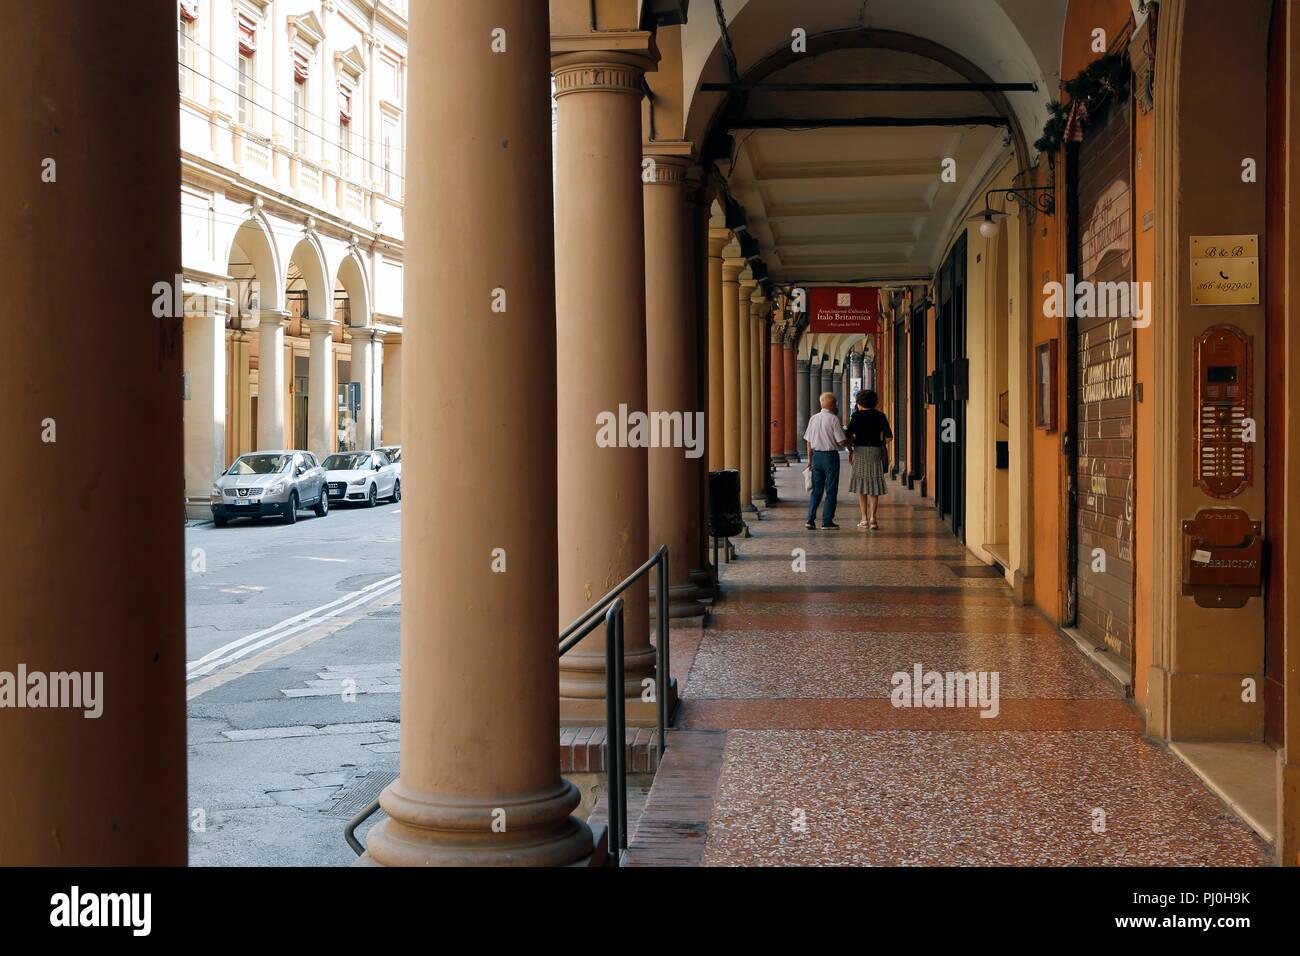 Typical arcades, Bologna, Emilia Romagna, Italy - Stock Image